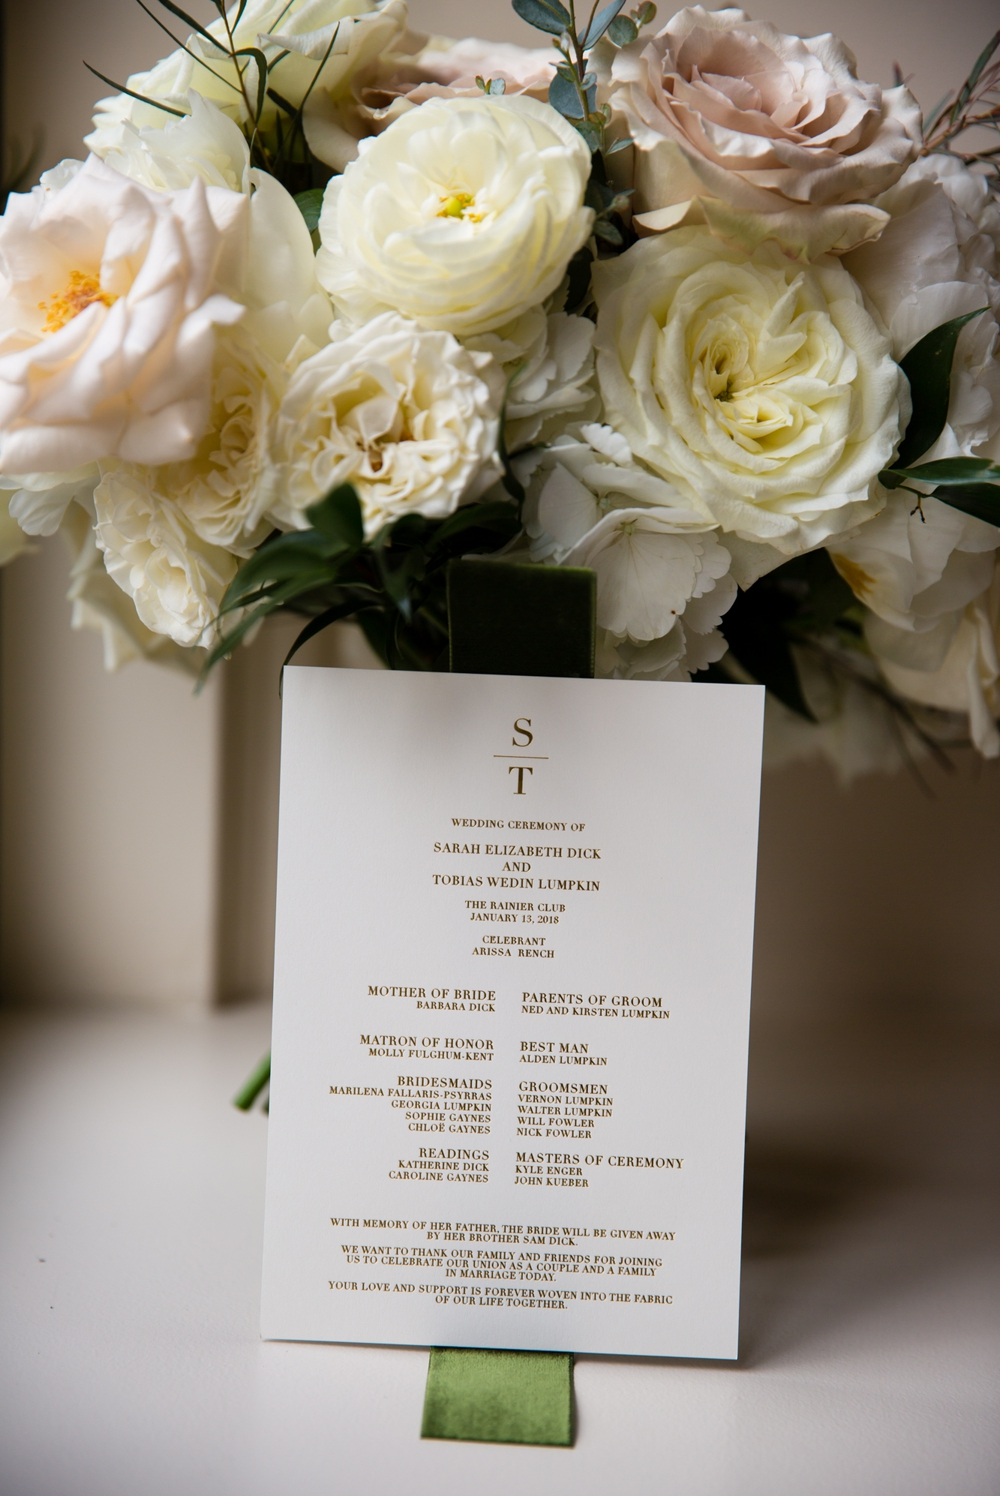 wedding-program-and-bouquet